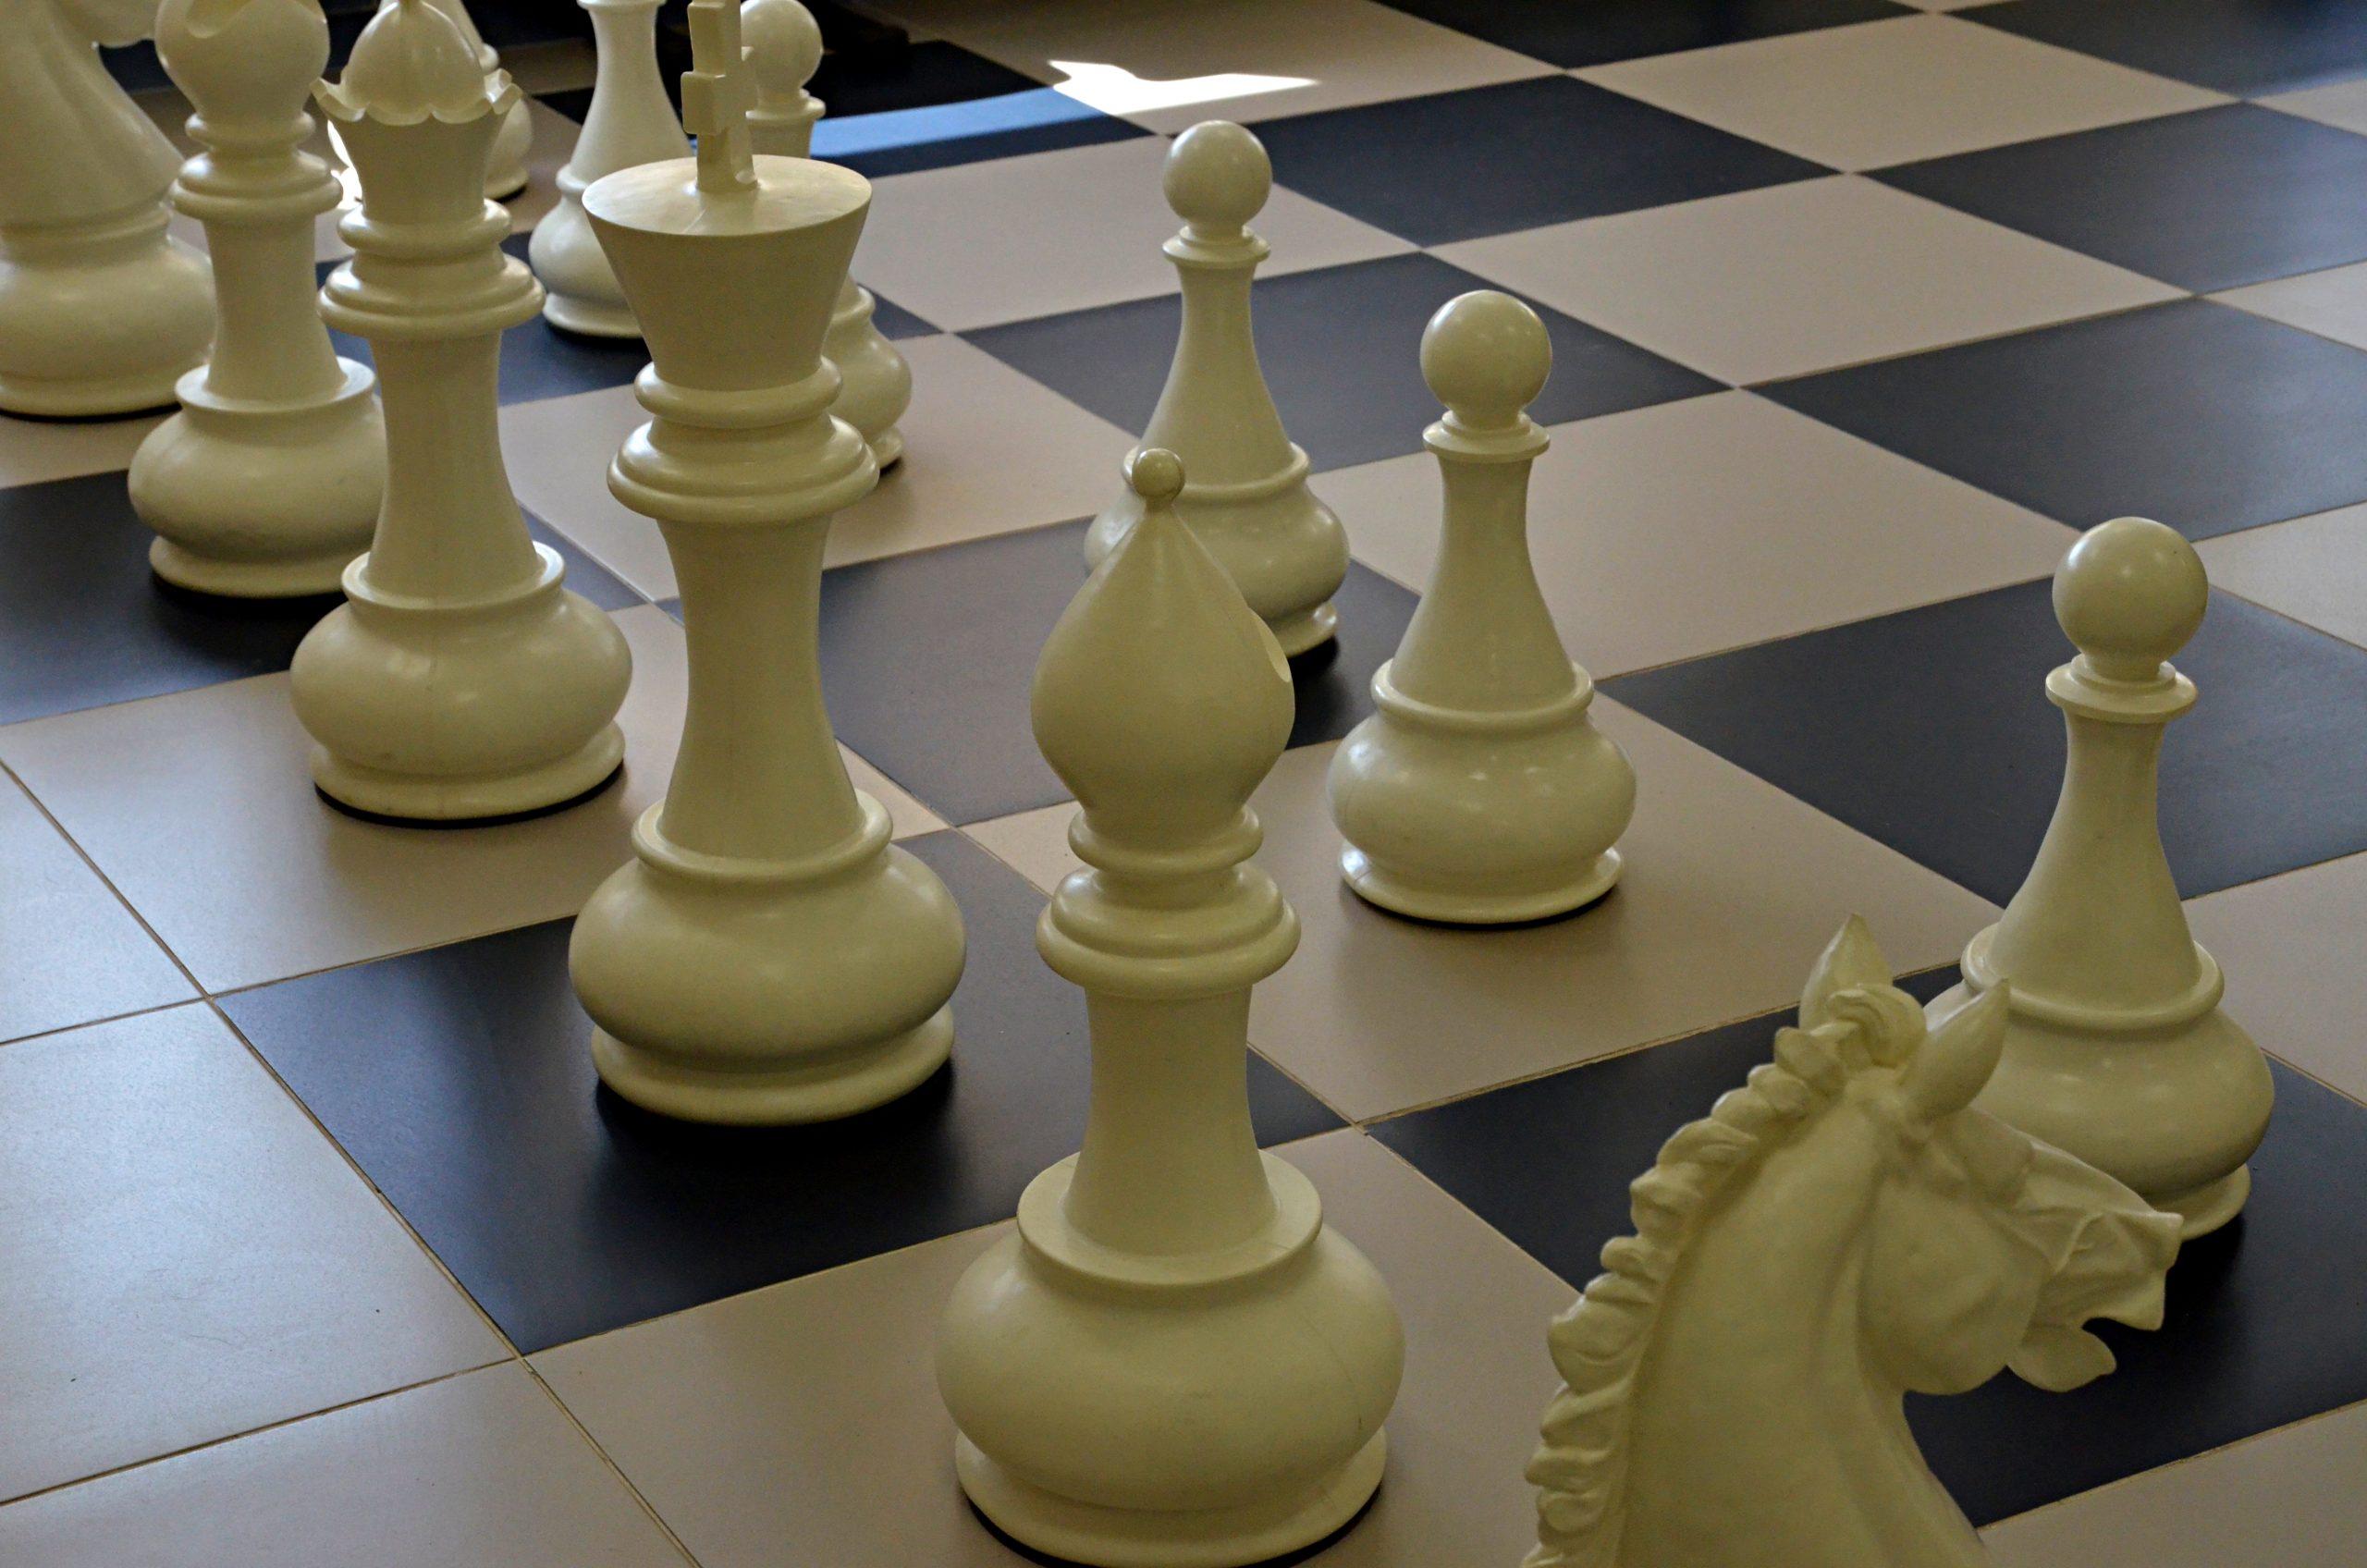 Онлайн-турнир по шахматам пройдет в Марушкинском